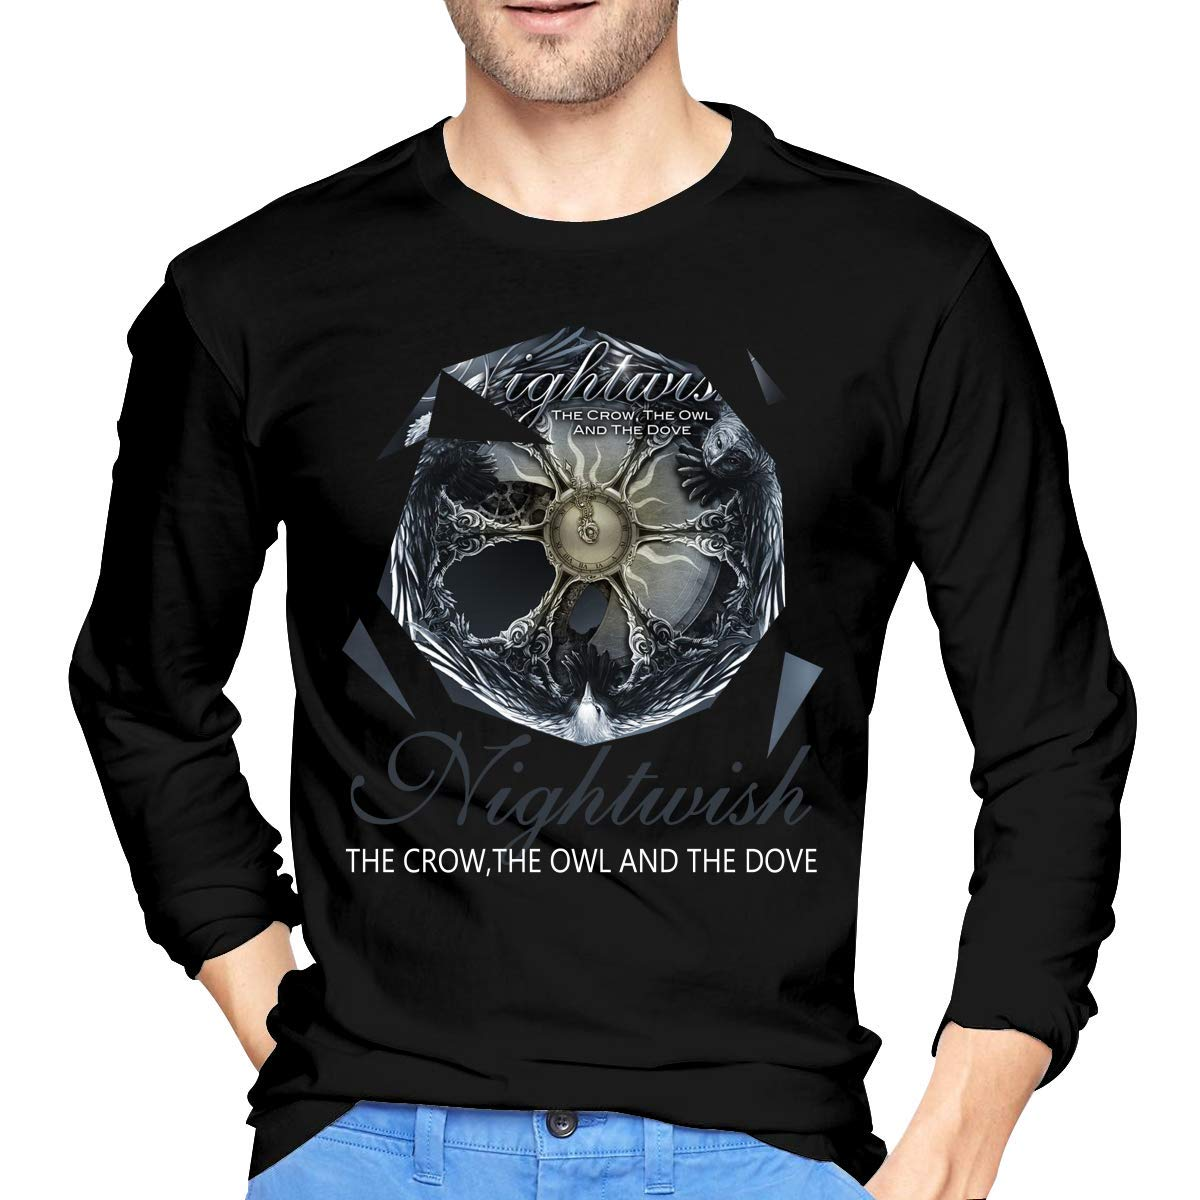 Fssatung S Nightwish The Crow The Owl And The Dove Tee Black Shirts